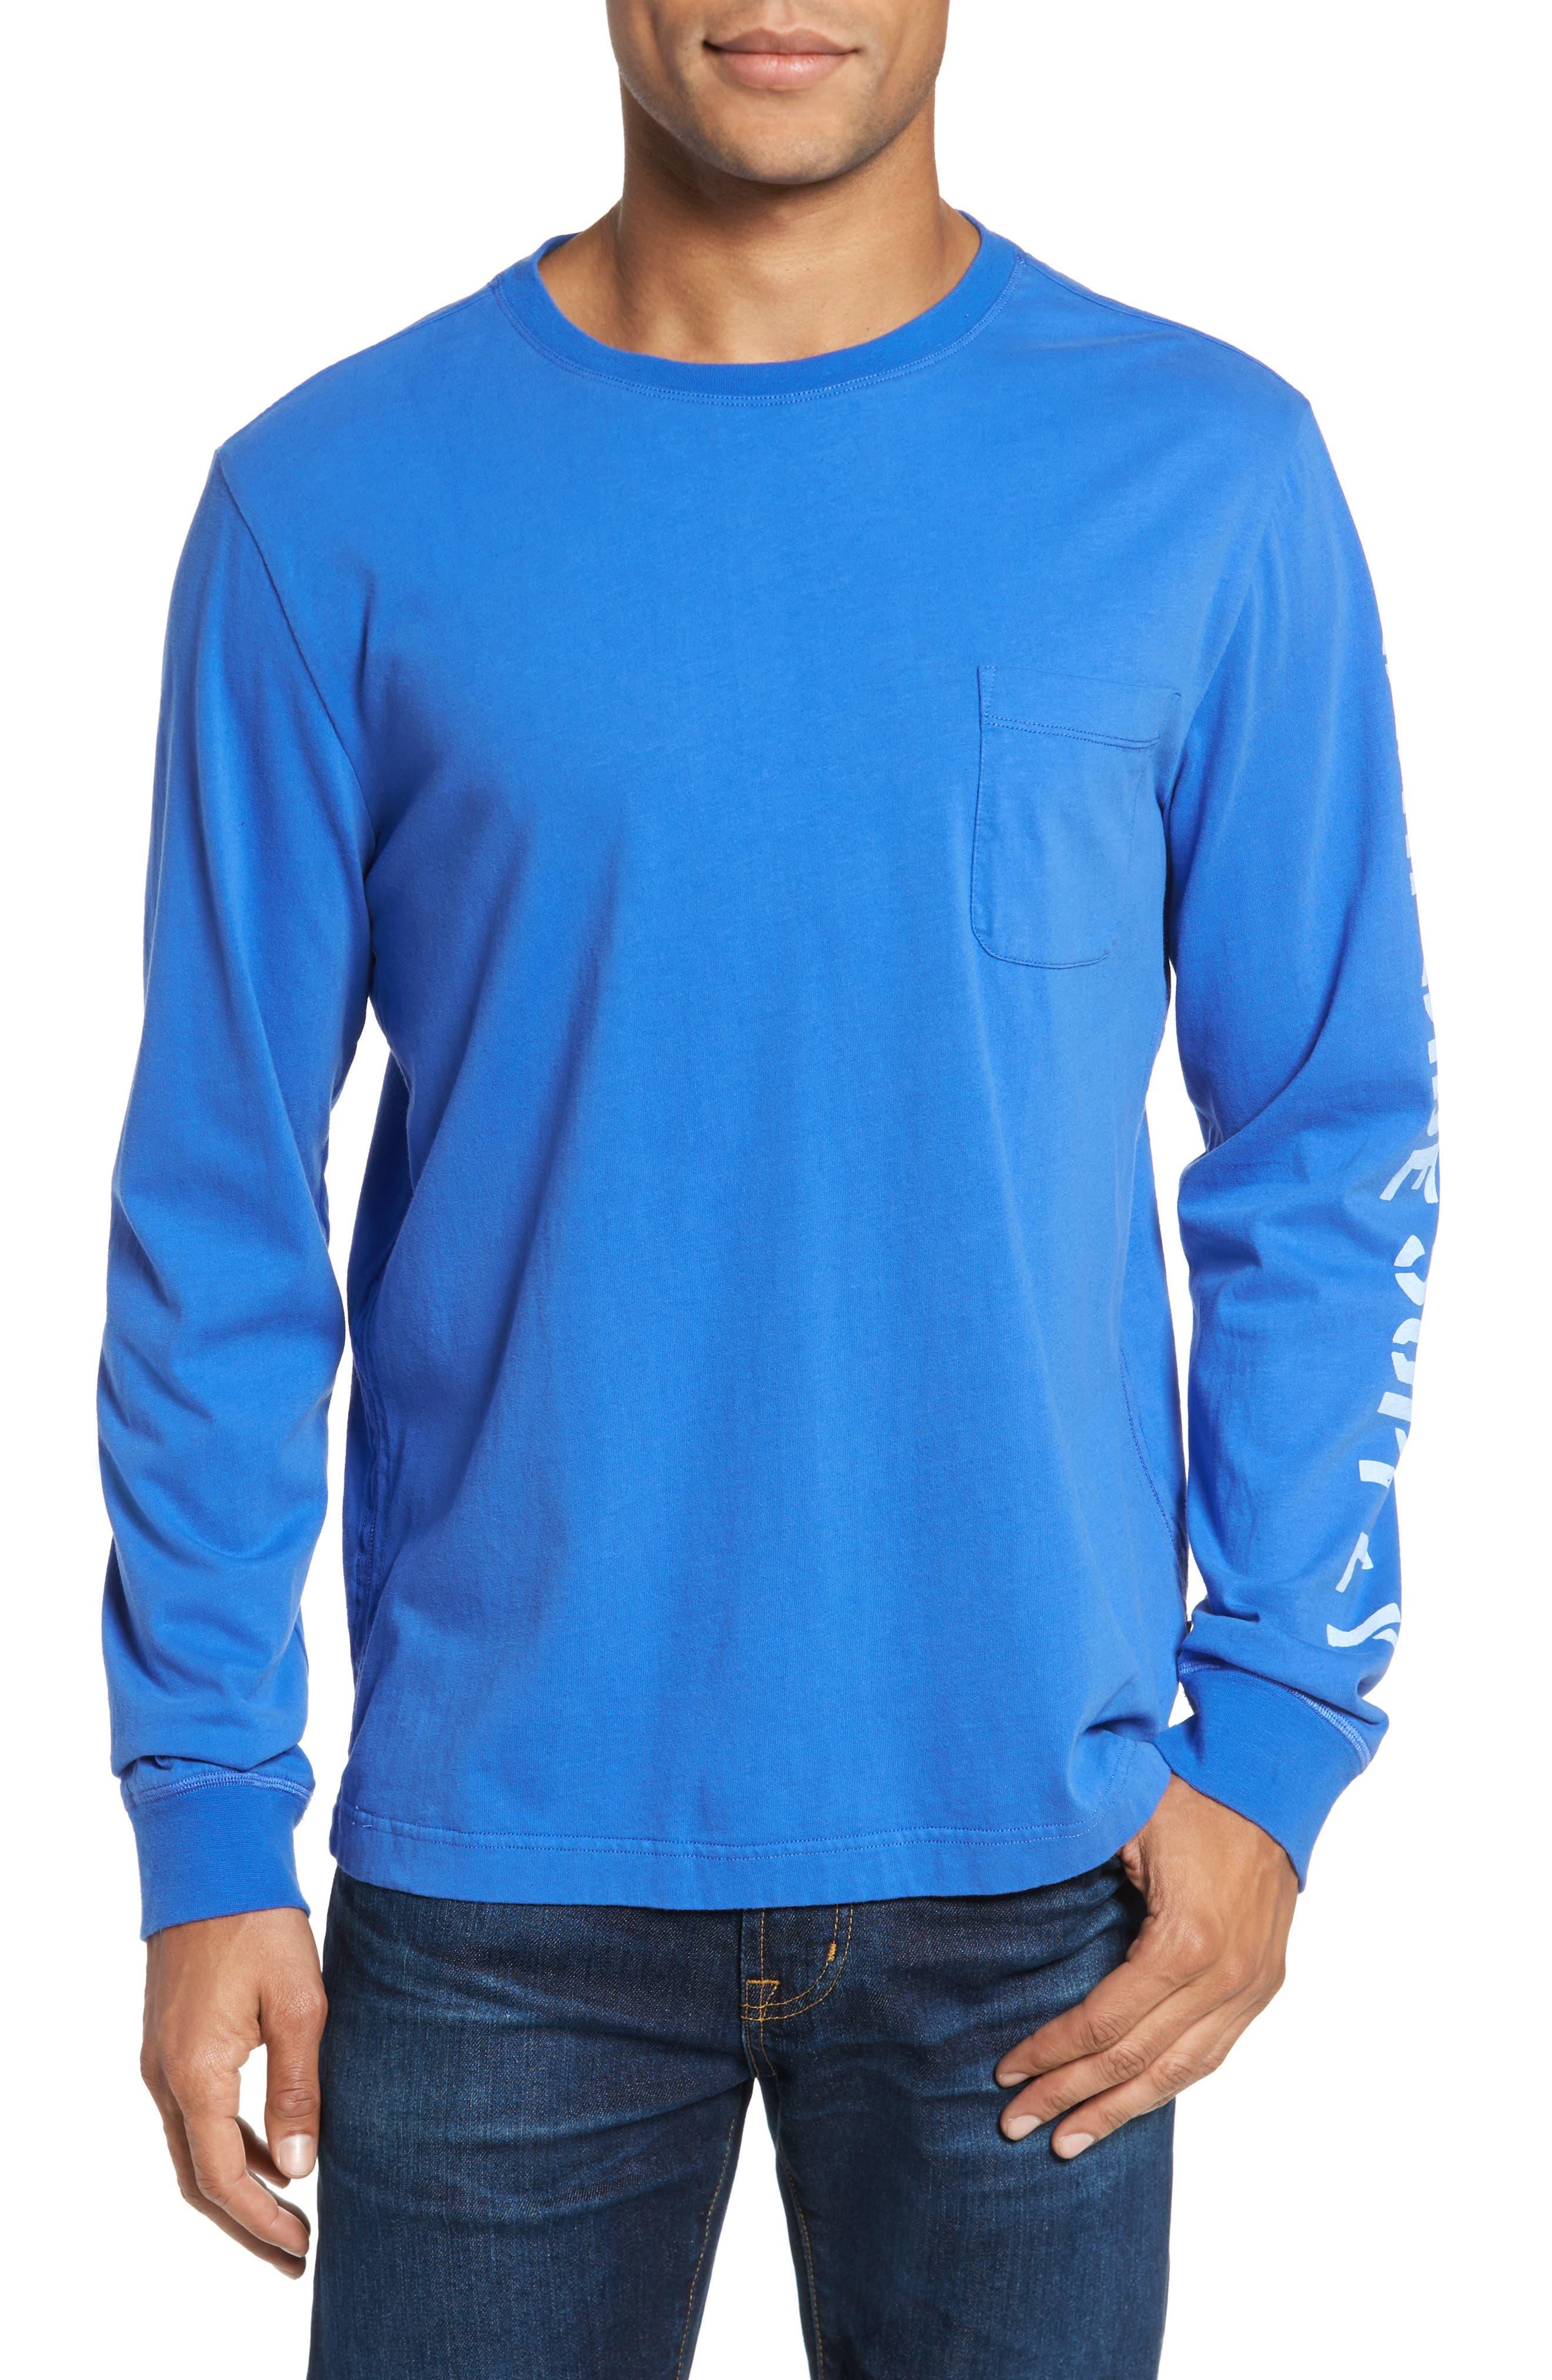 Alternate Image 1 Selected - Surfside Supply Logo Jersey Crewneck T-Shirt